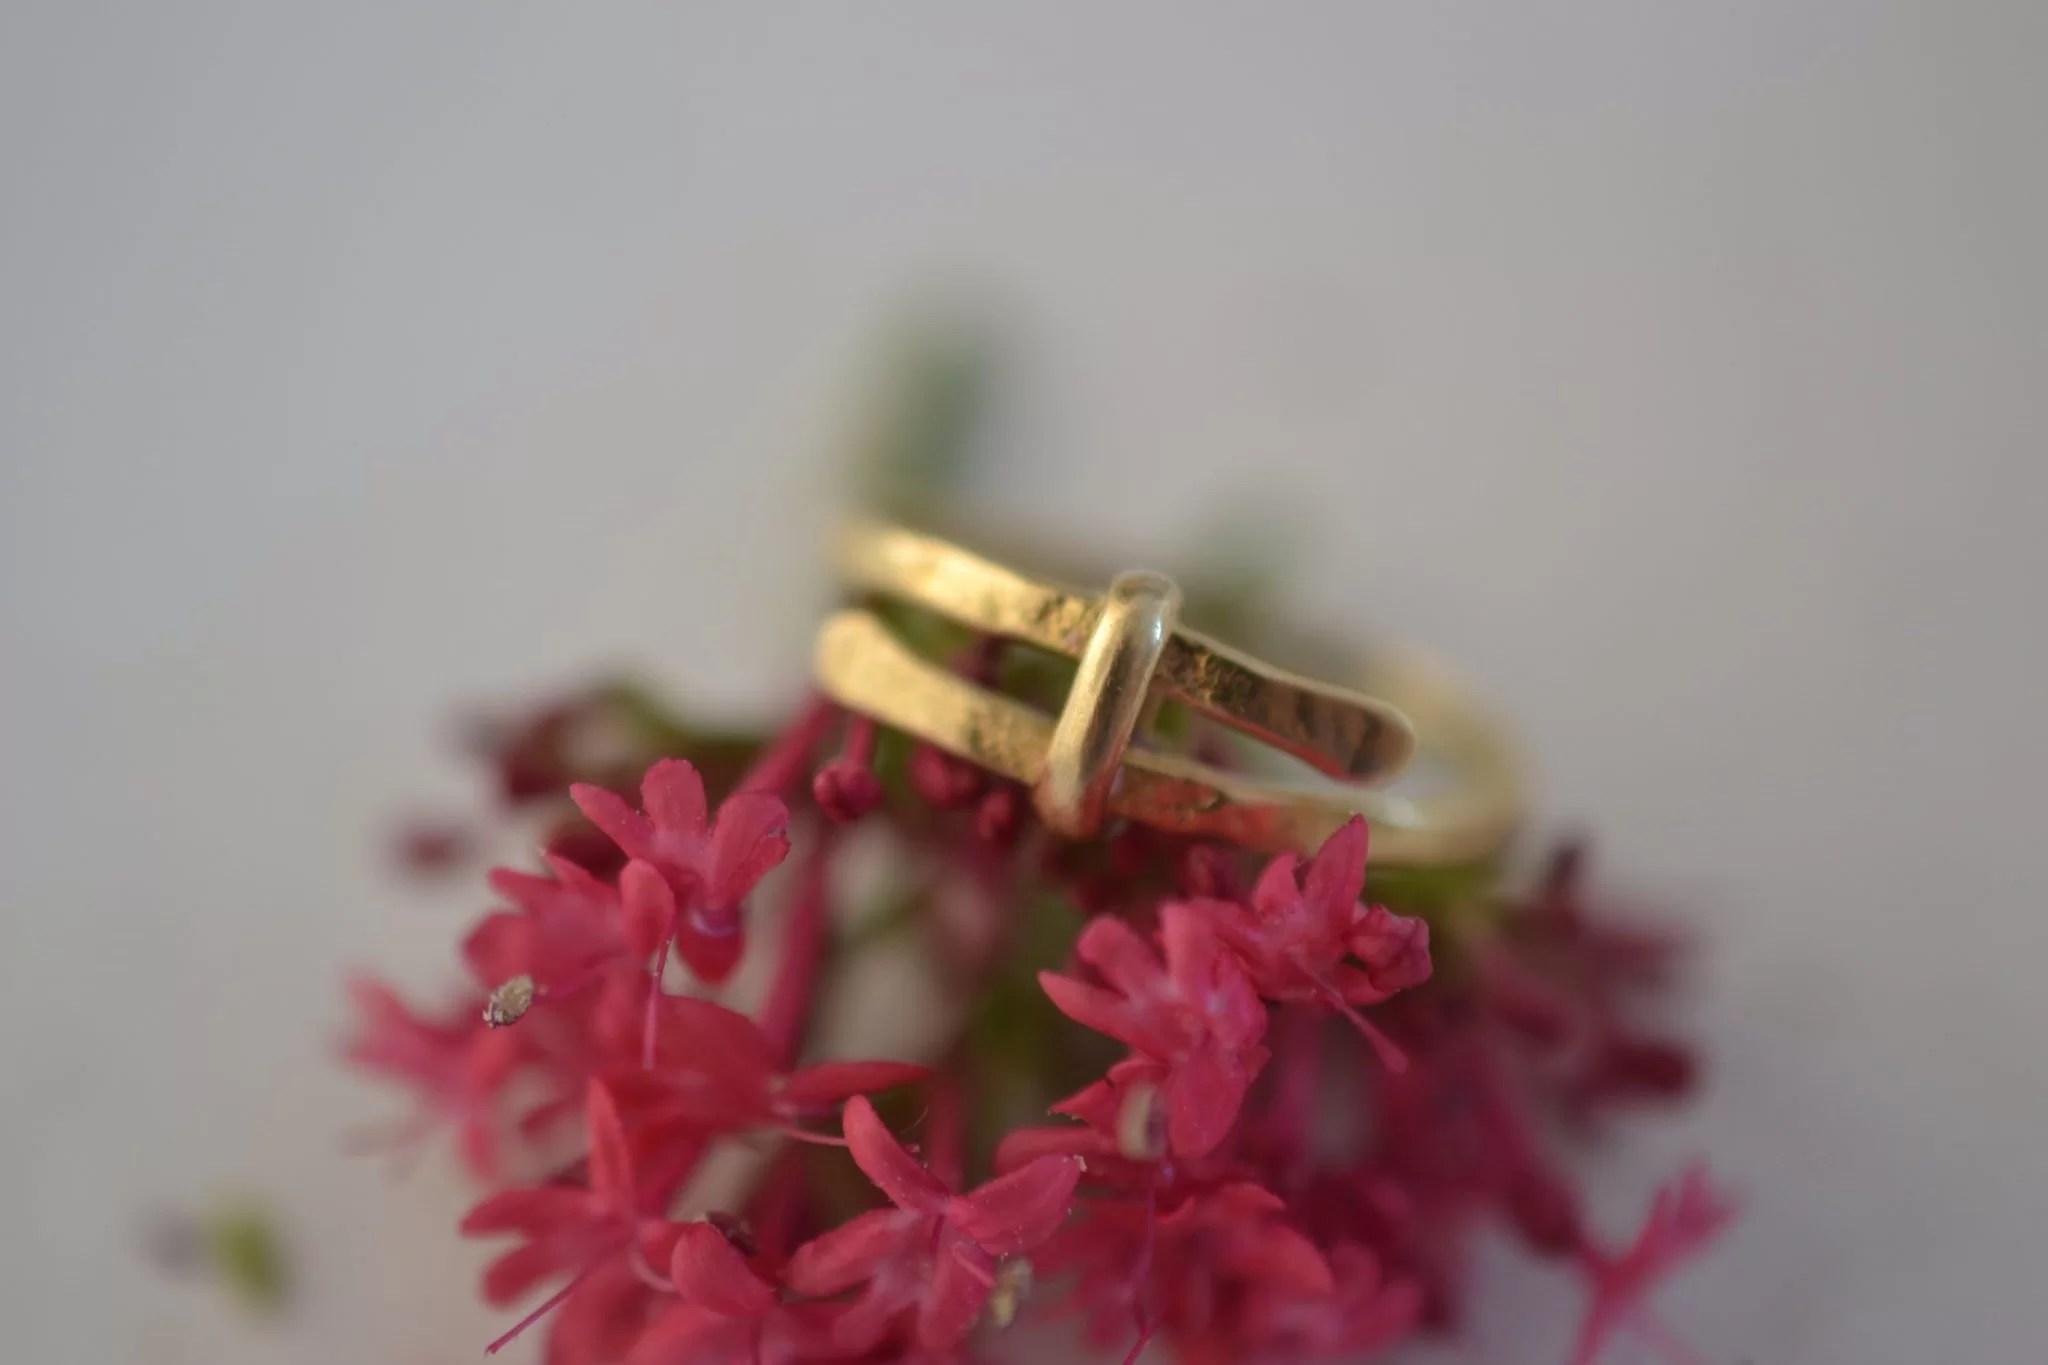 bague martlée en or - Bijou vintage certifé - 18 carats - bijoux seconde main